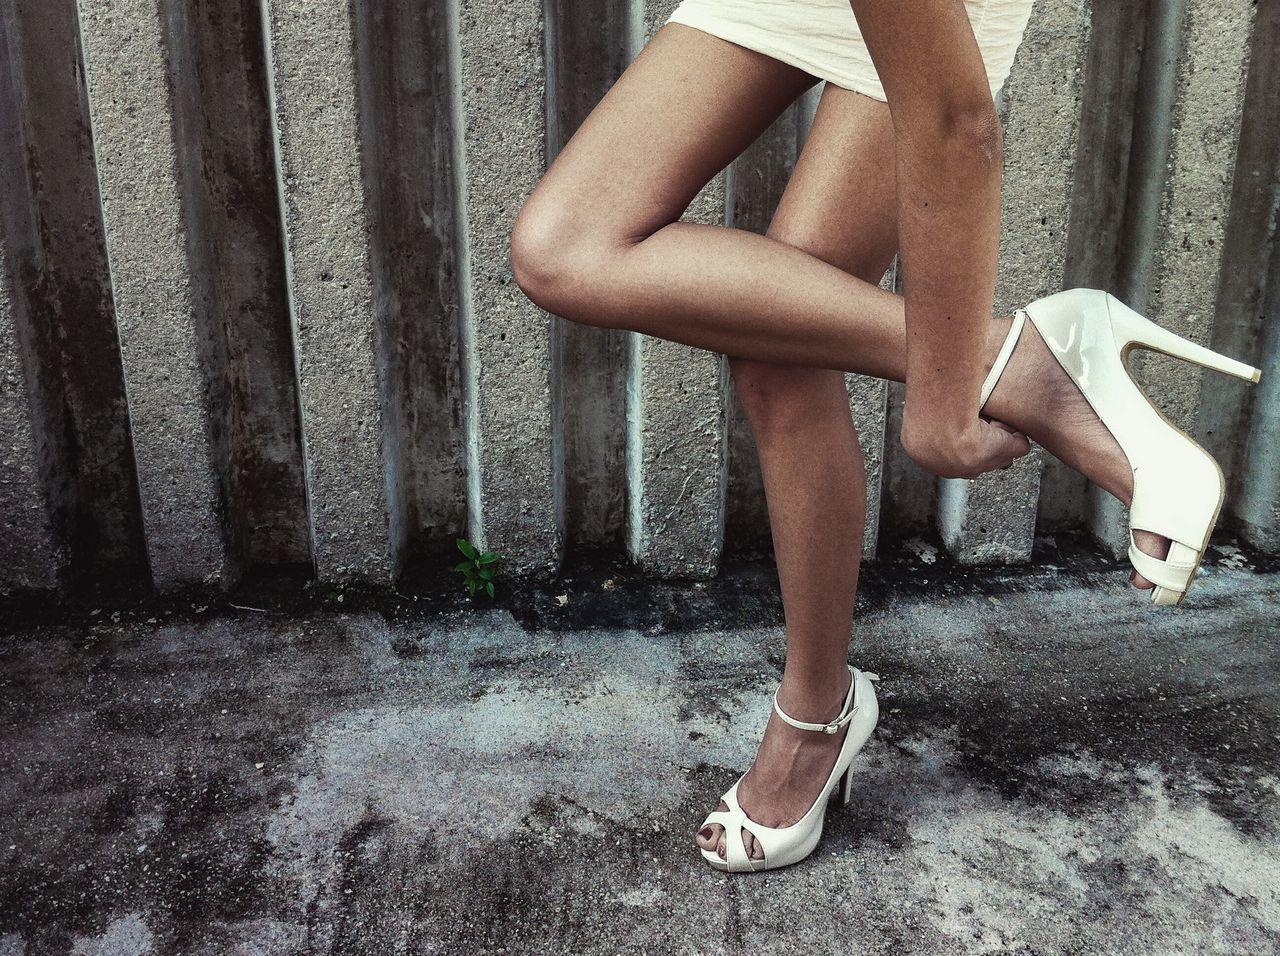 Beautiful stock photos of fashion, human leg, human body part, one person, high heels